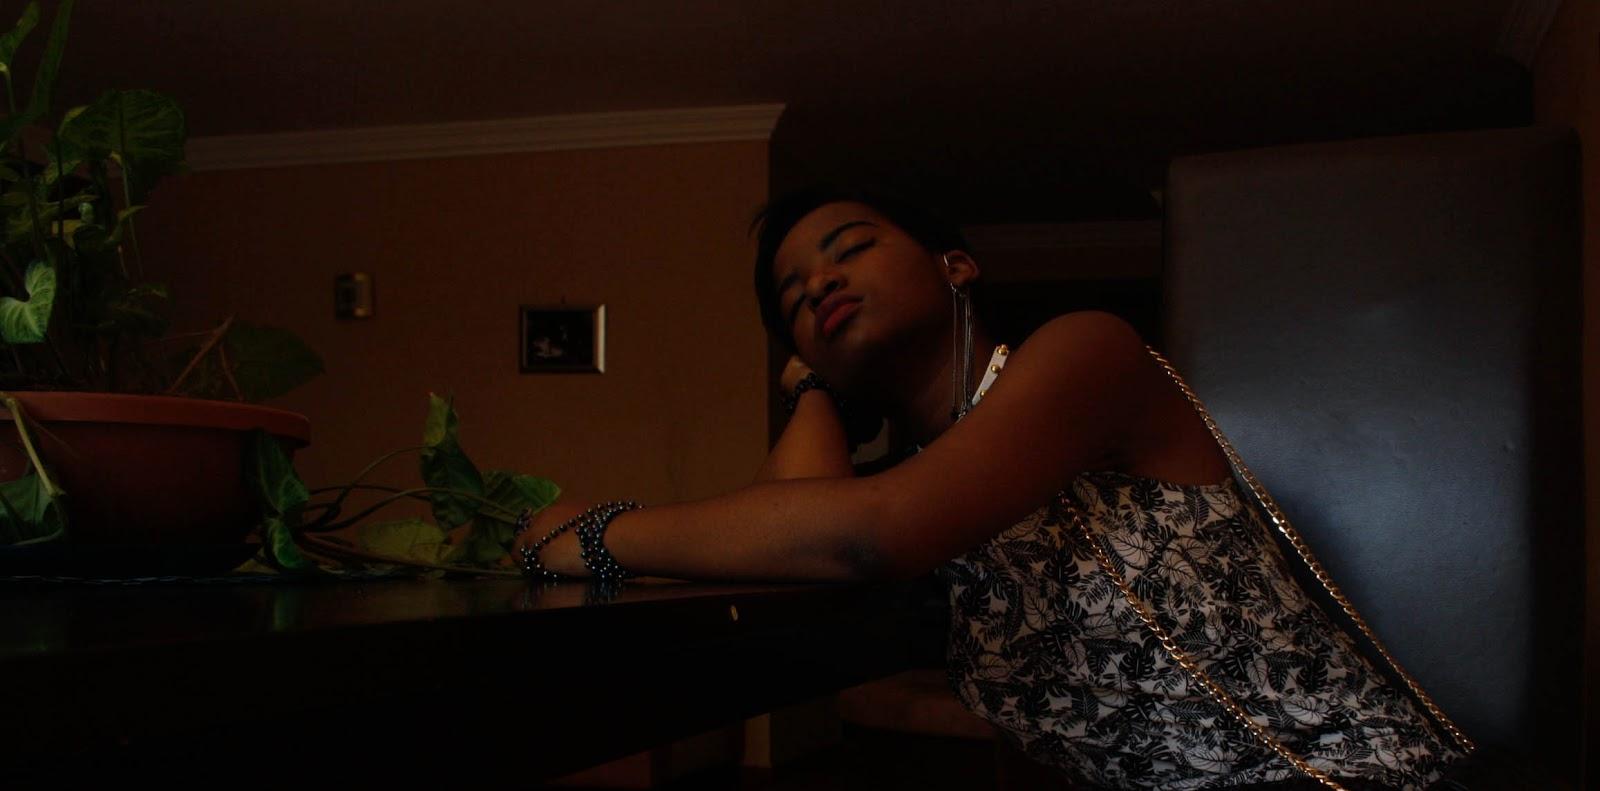 romantic photography sleeping black girl